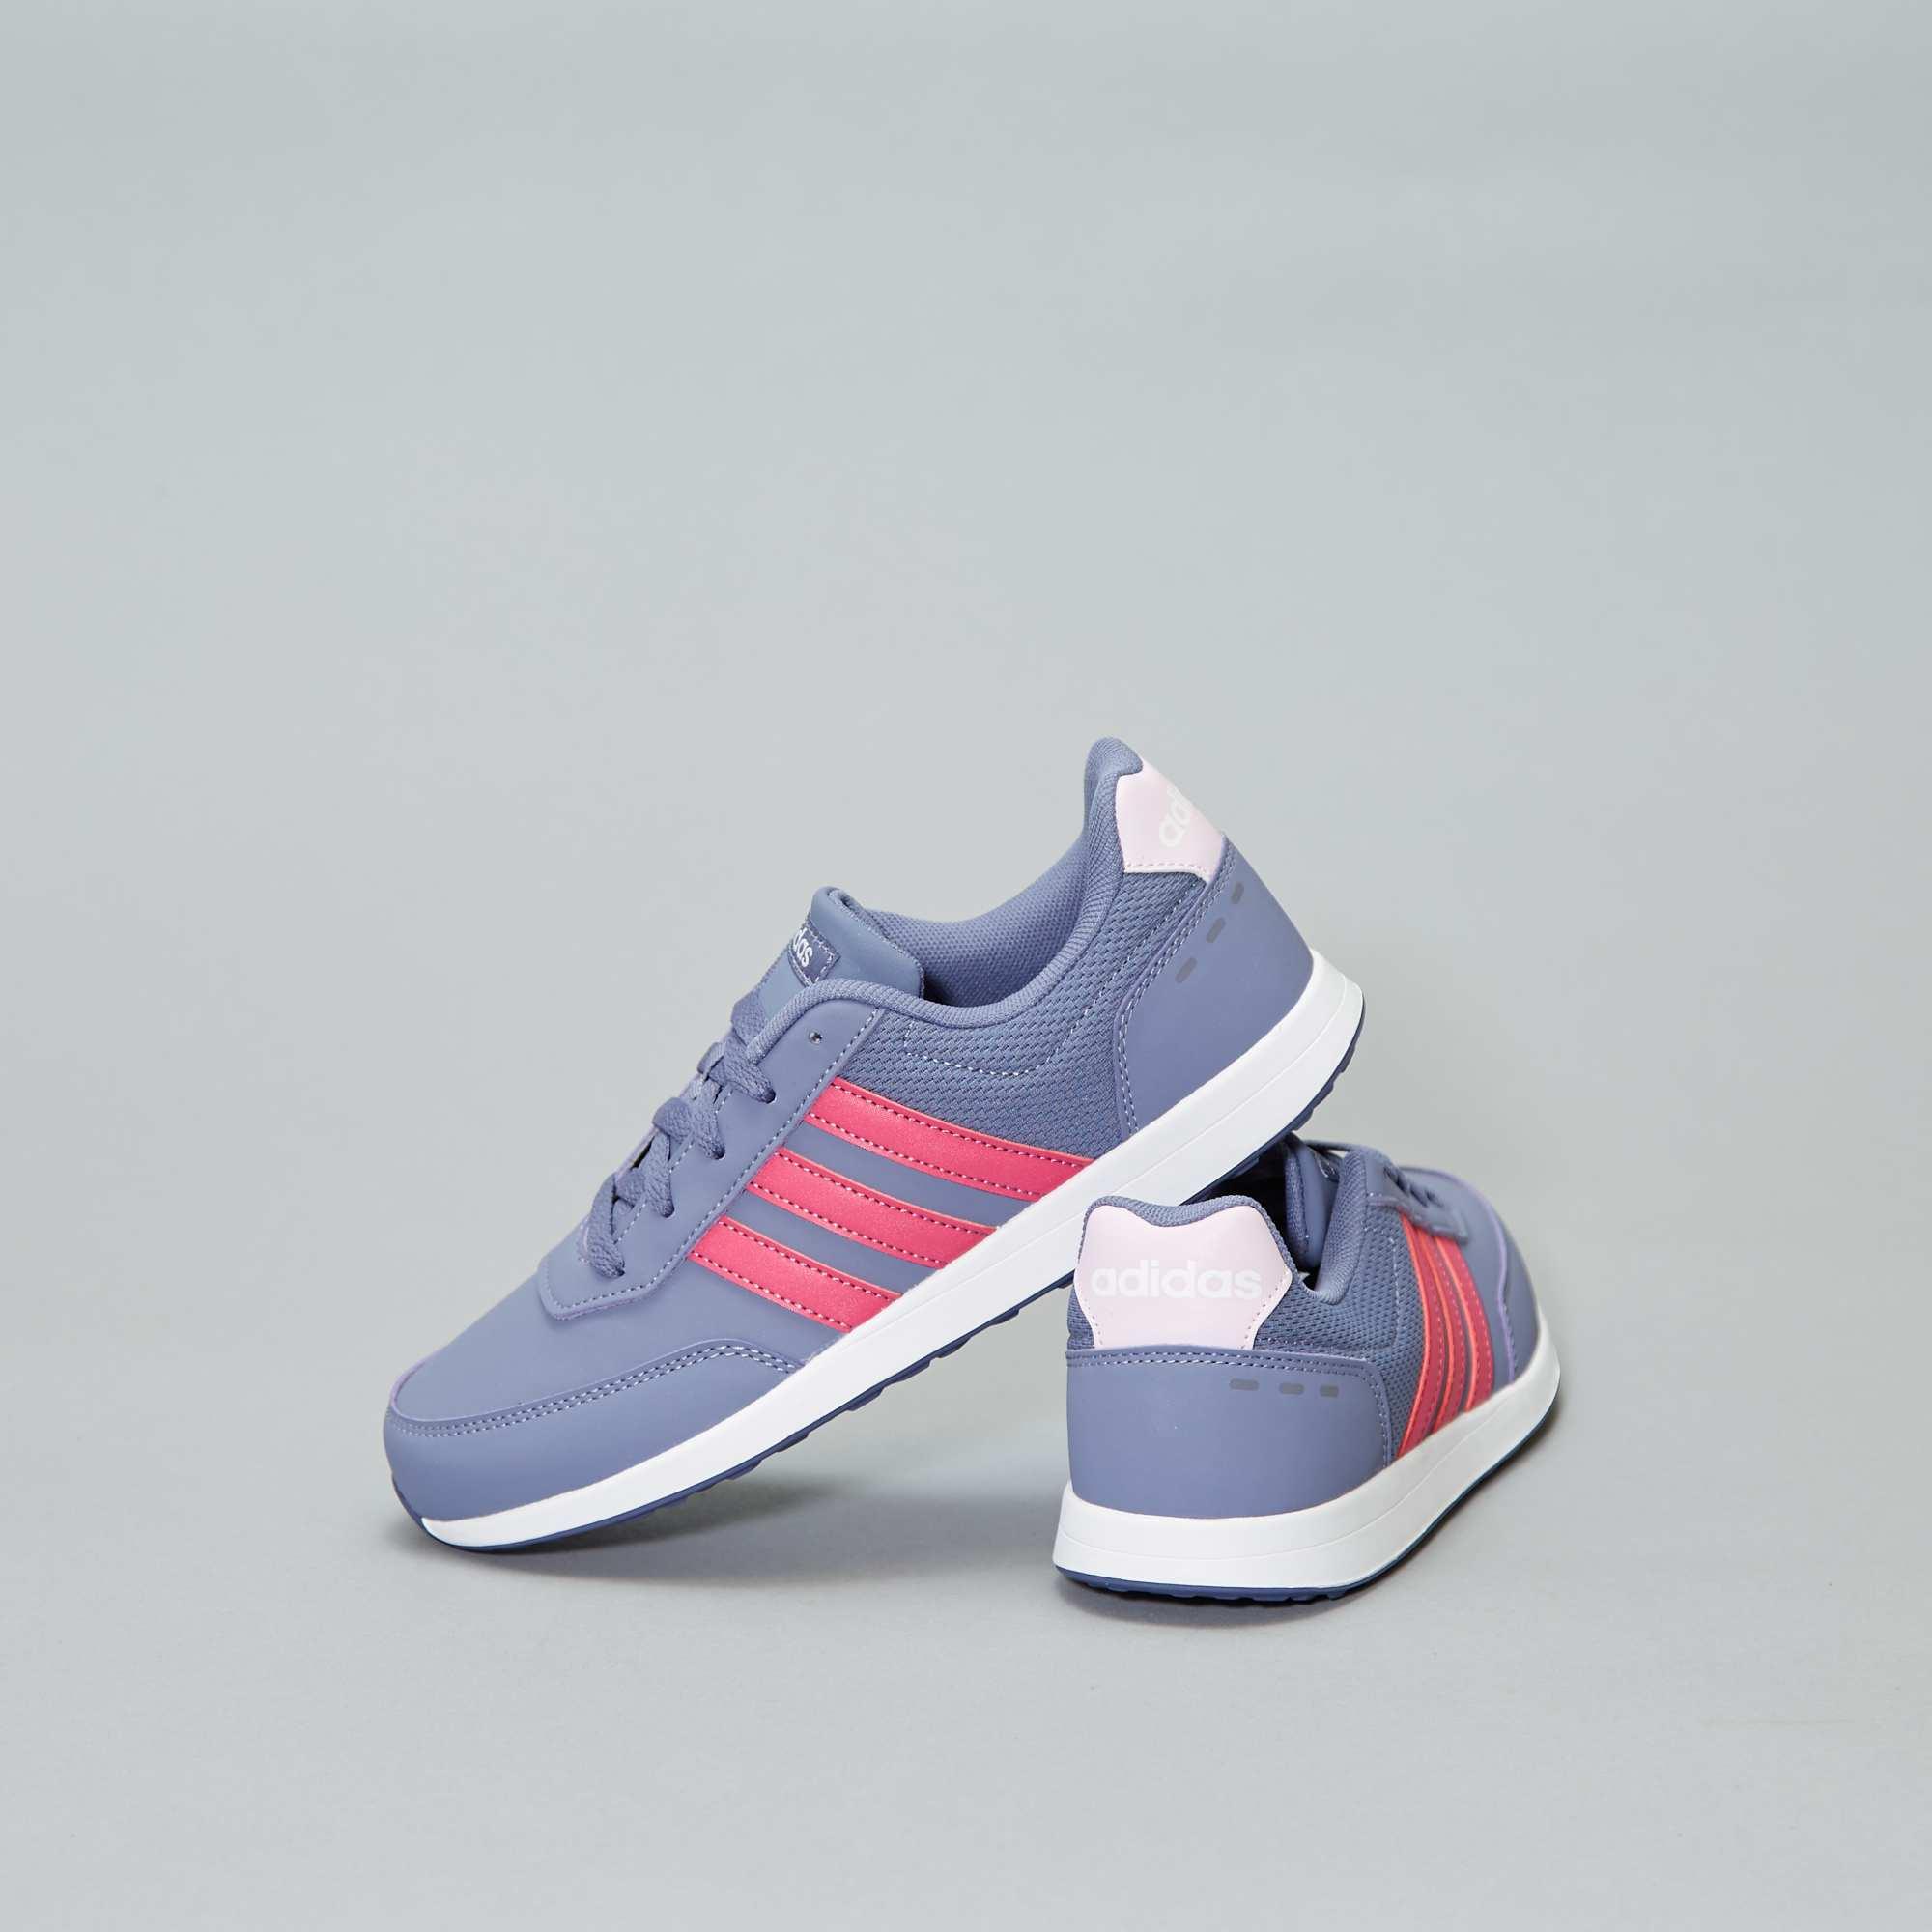 0f32800c443 Zapatillas deportivas bajas  Adidas   VS Switch 2 K  AZUL Mujer talla 34.  Loading zoom